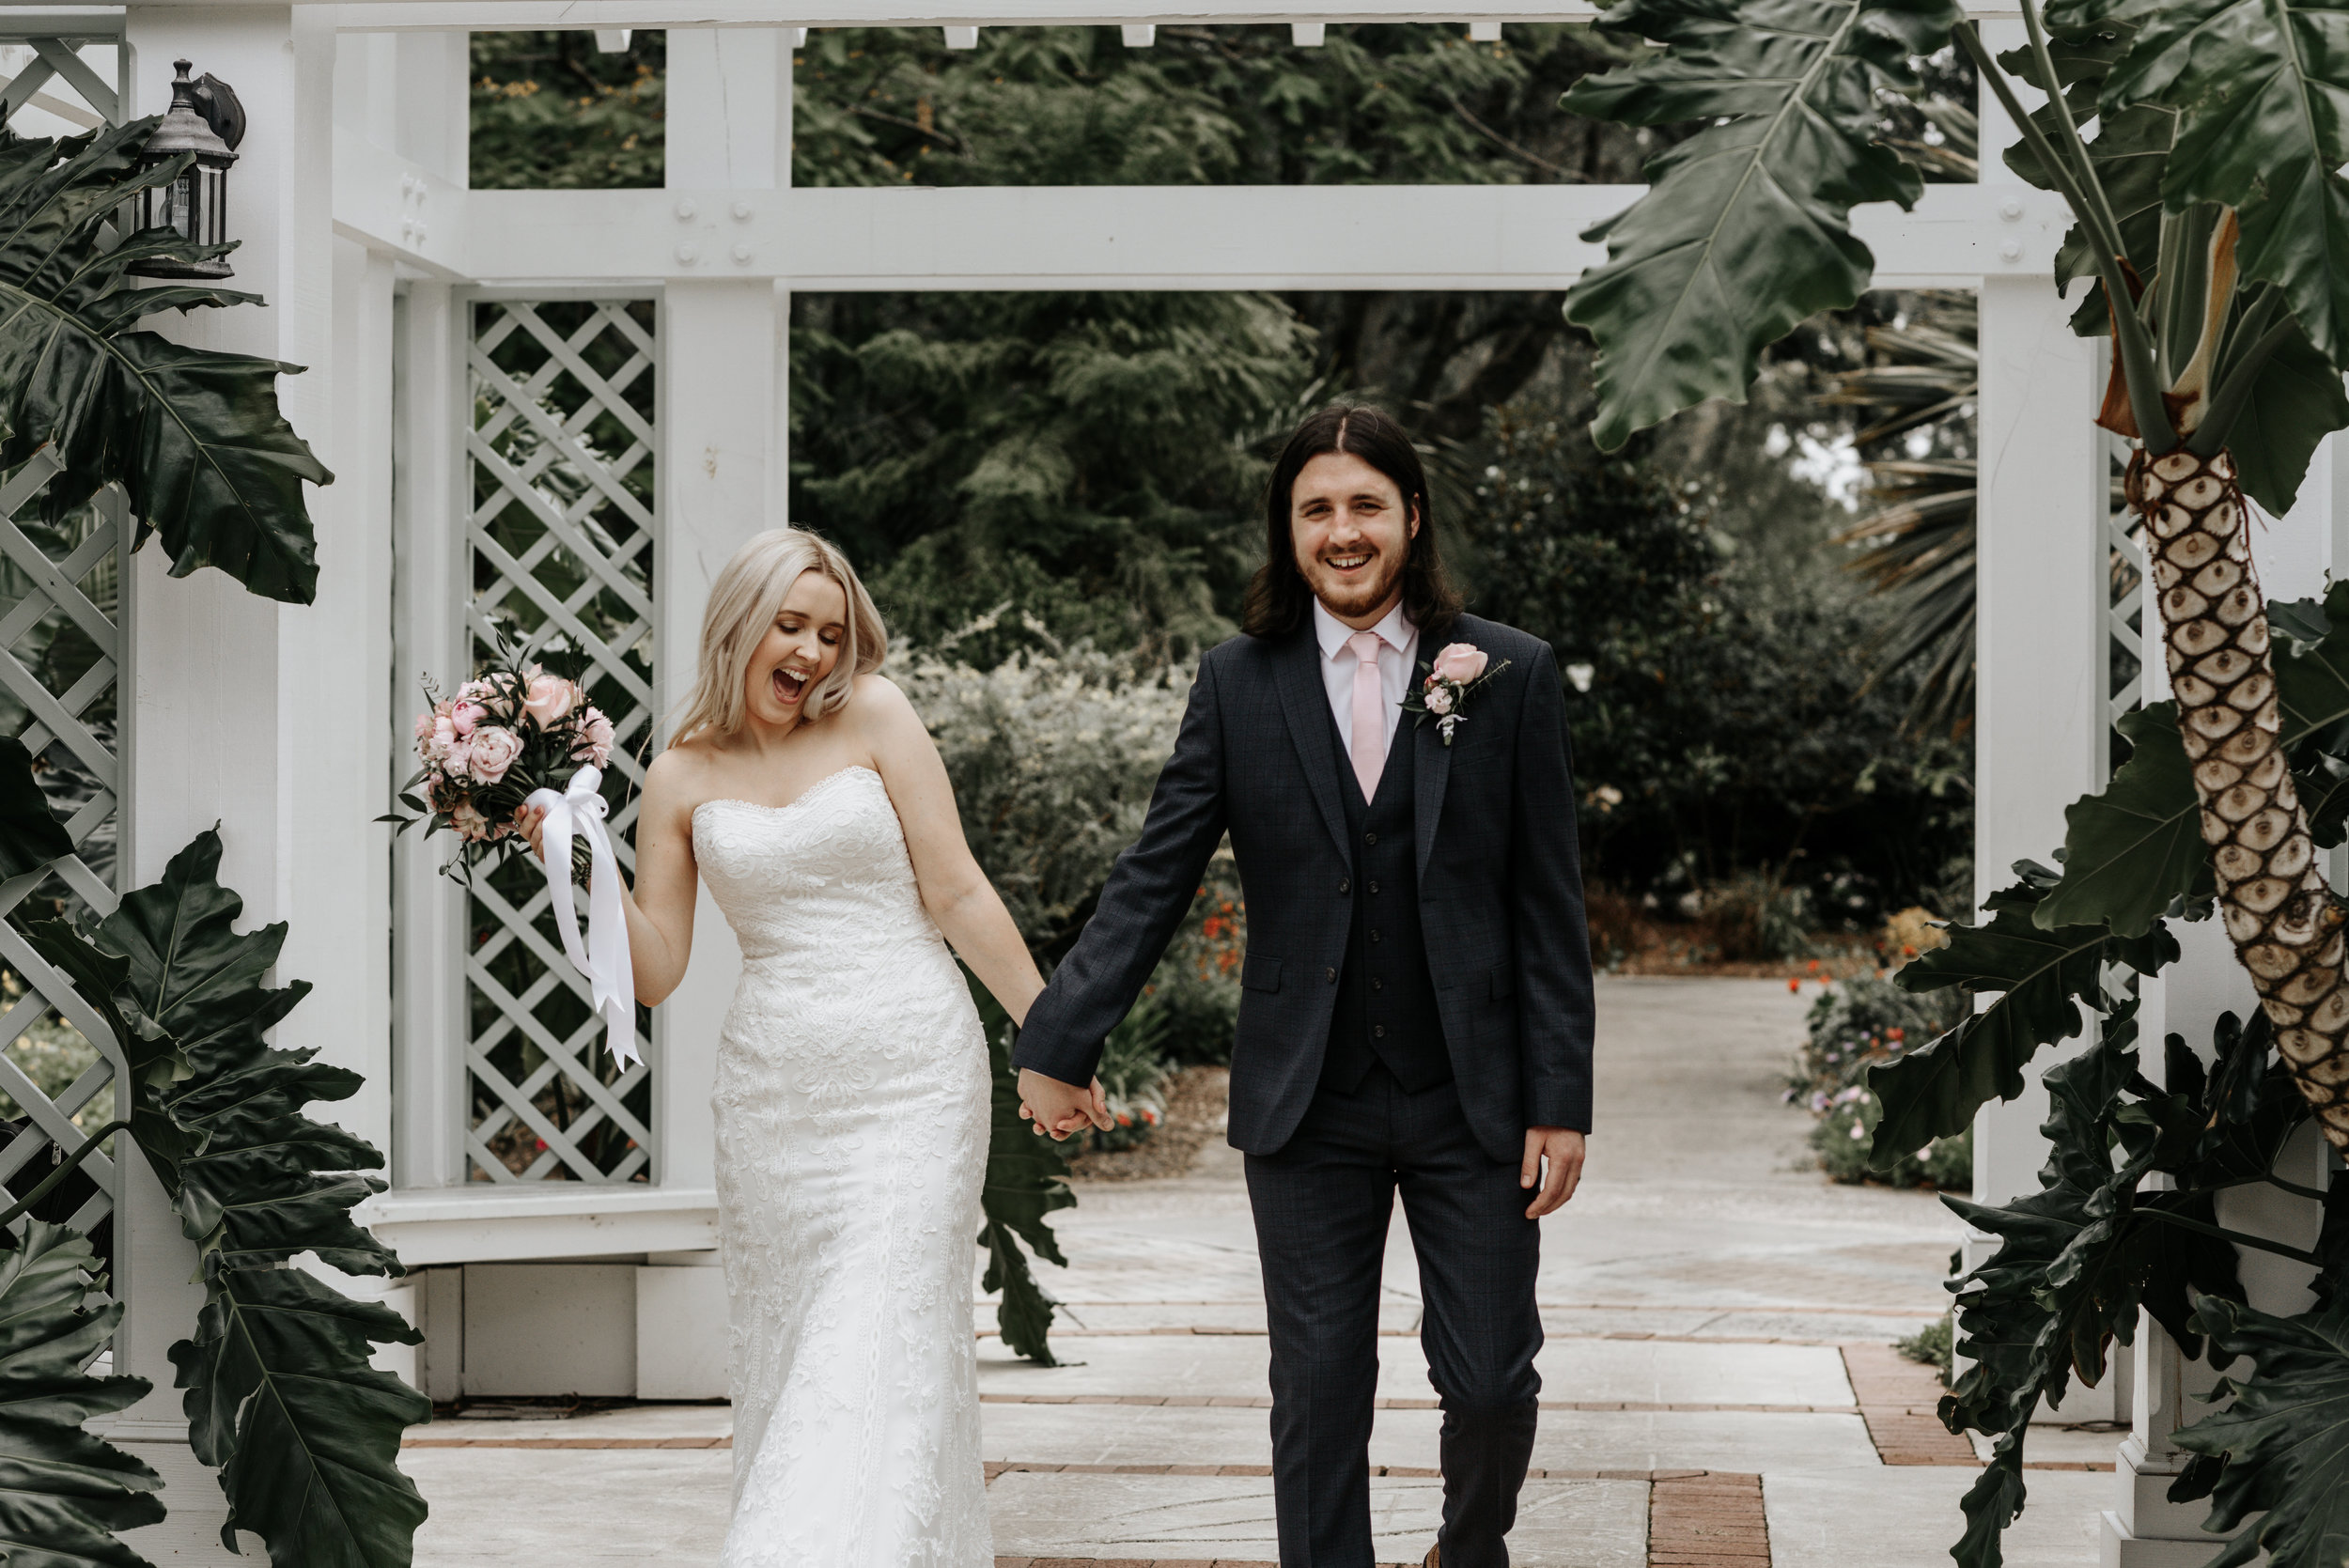 Lora-Richard-Wedding-1131.jpg